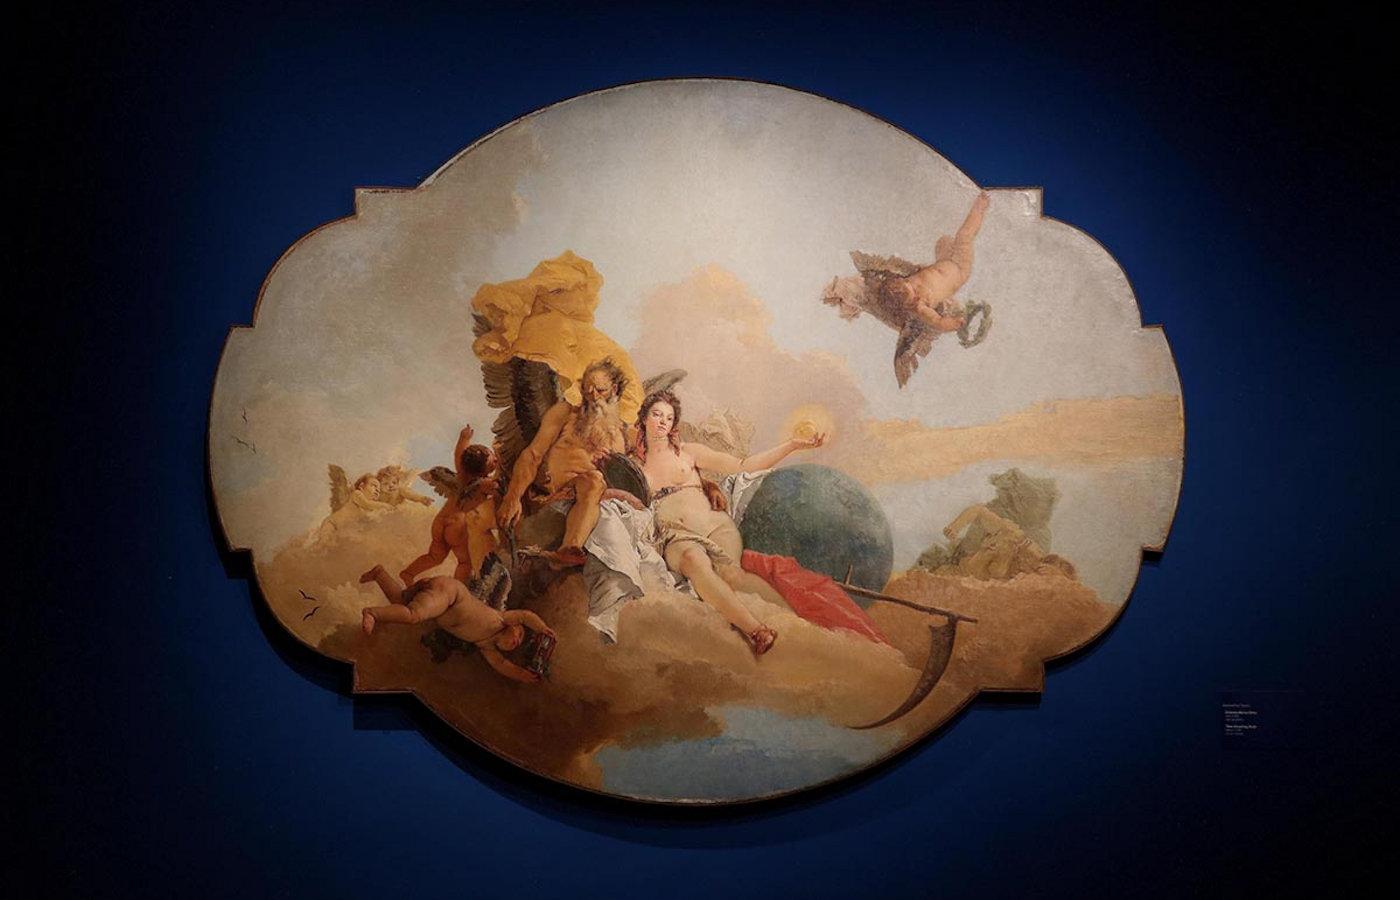 Tiepolo and Contemporaries